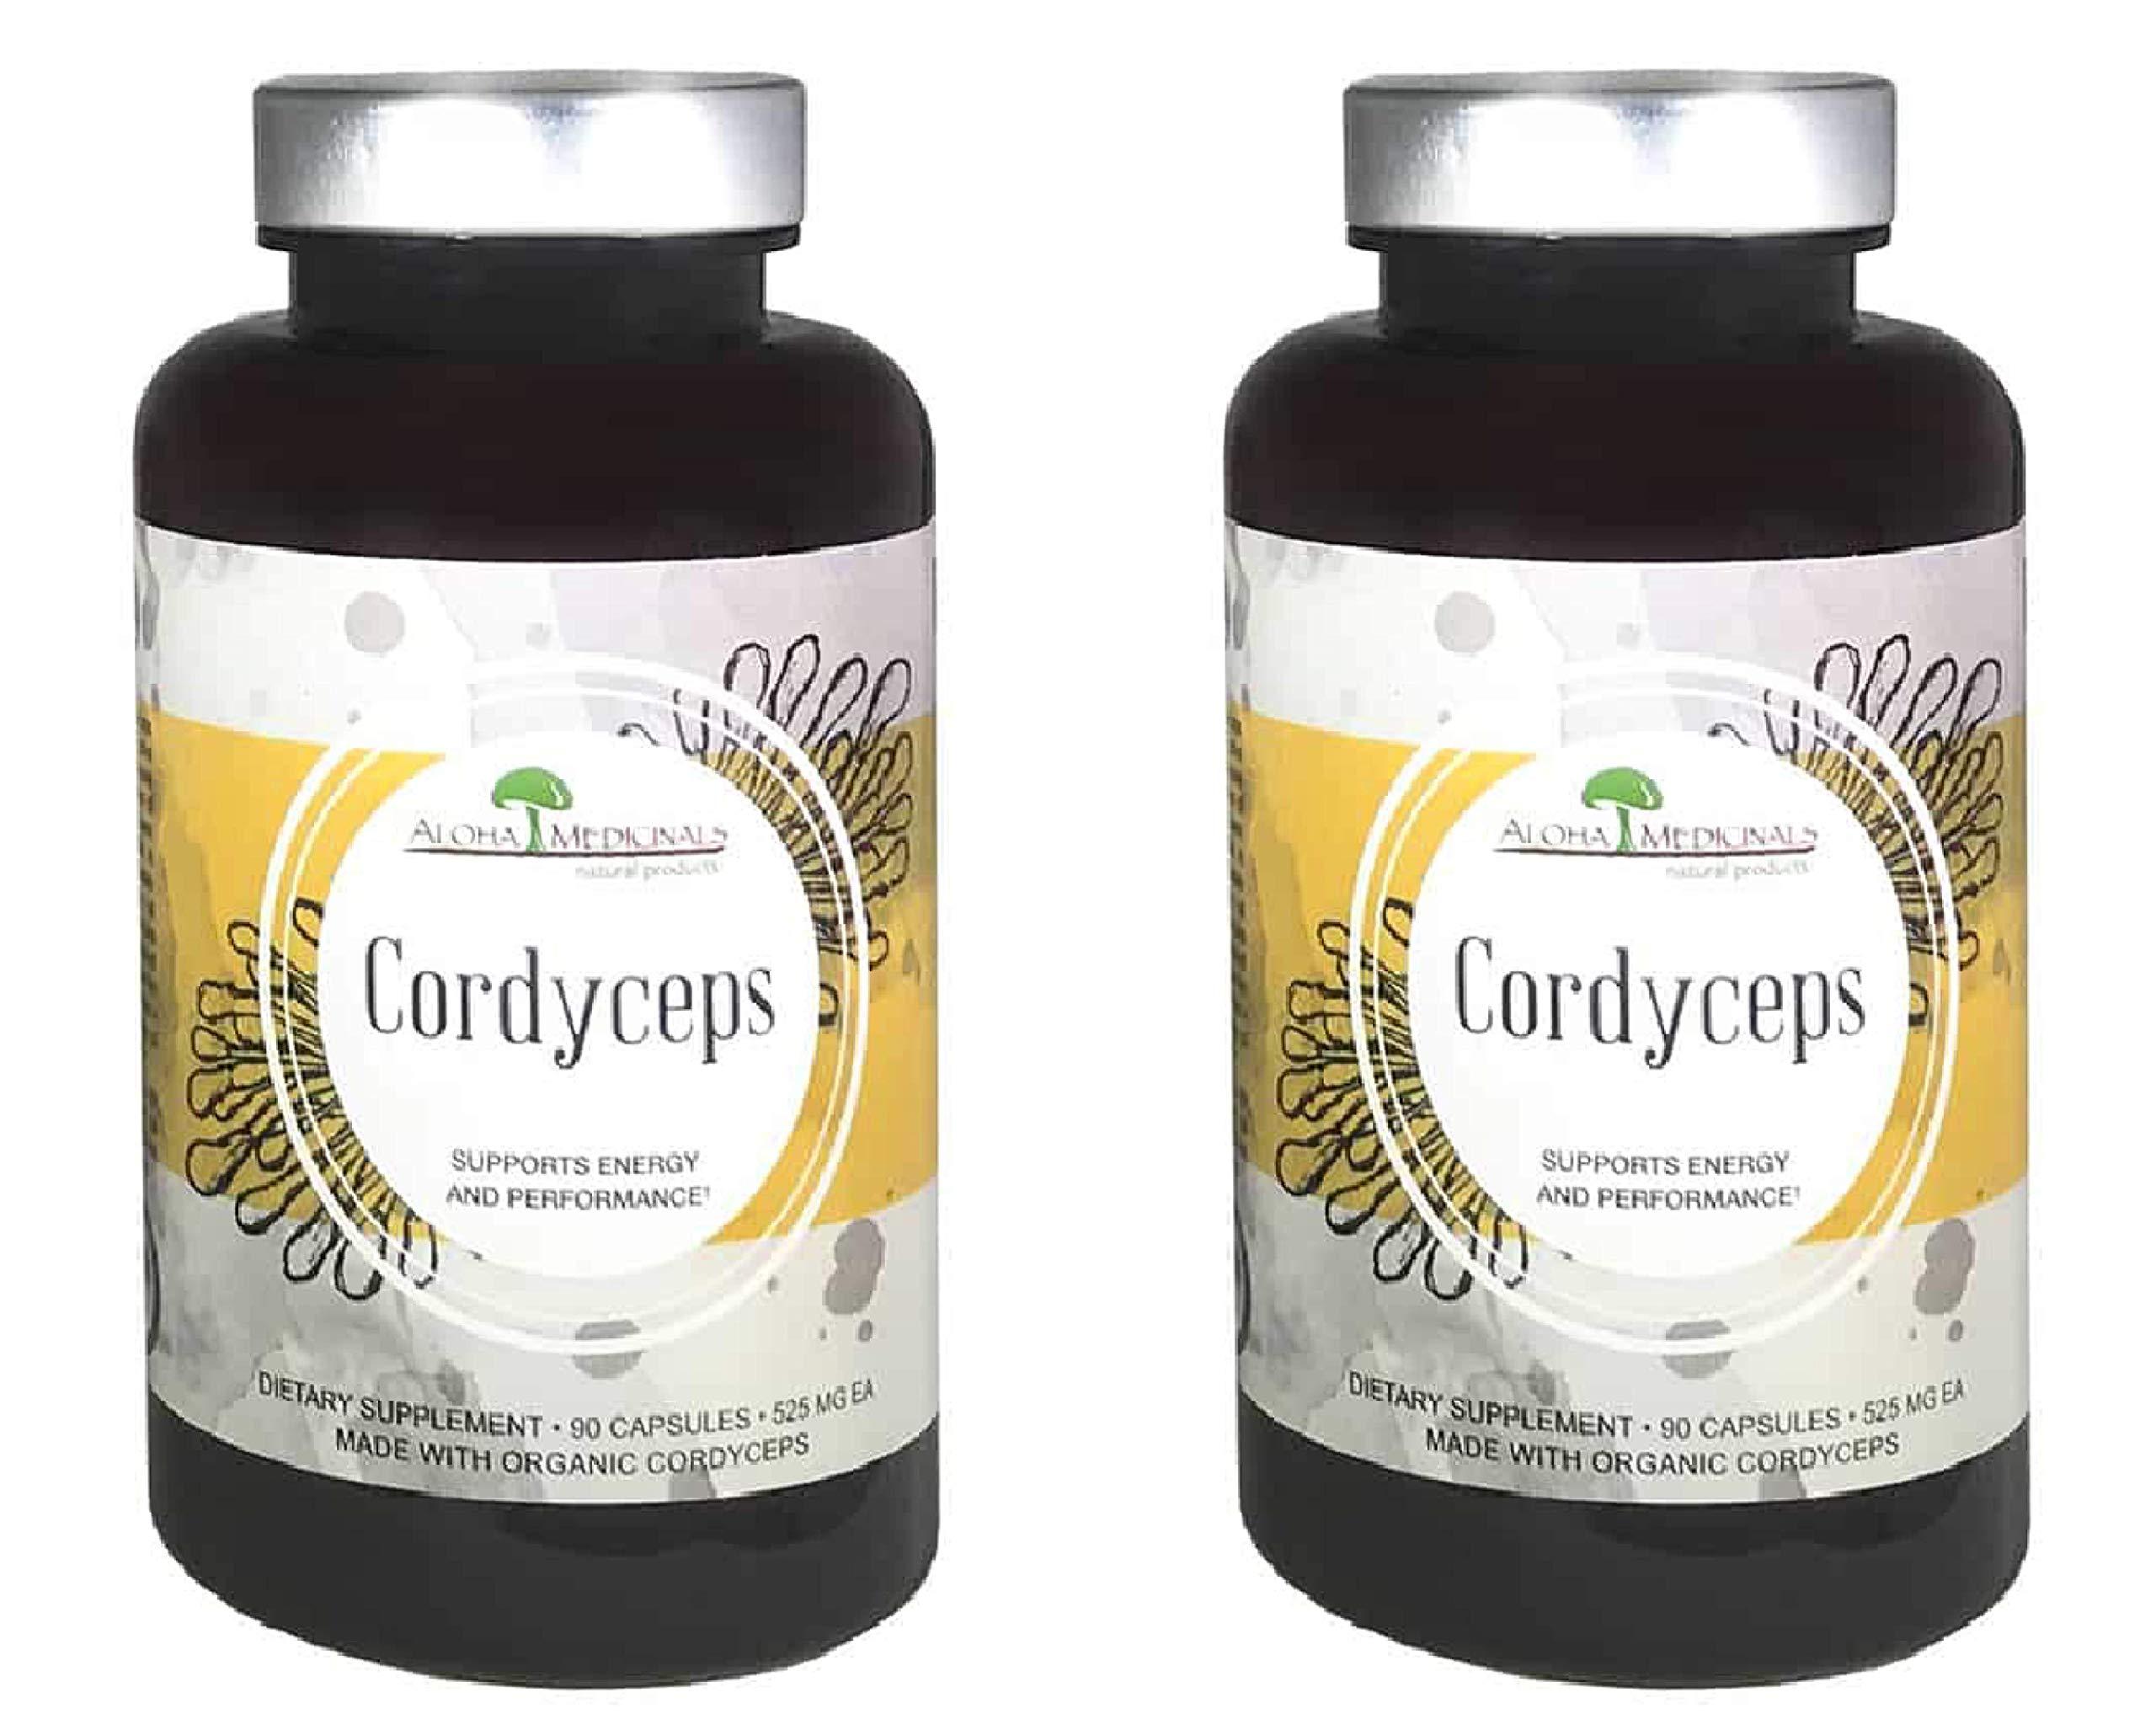 Aloha Medicinals - Pure Cordyceps - Certified Organic Mushrooms - Cordyceps Militaris - Cordyceps Sinensis - Supports Immunity, Energy and Stamina - 525mg - 90 Vegetarian Capsules (2-Bottles)